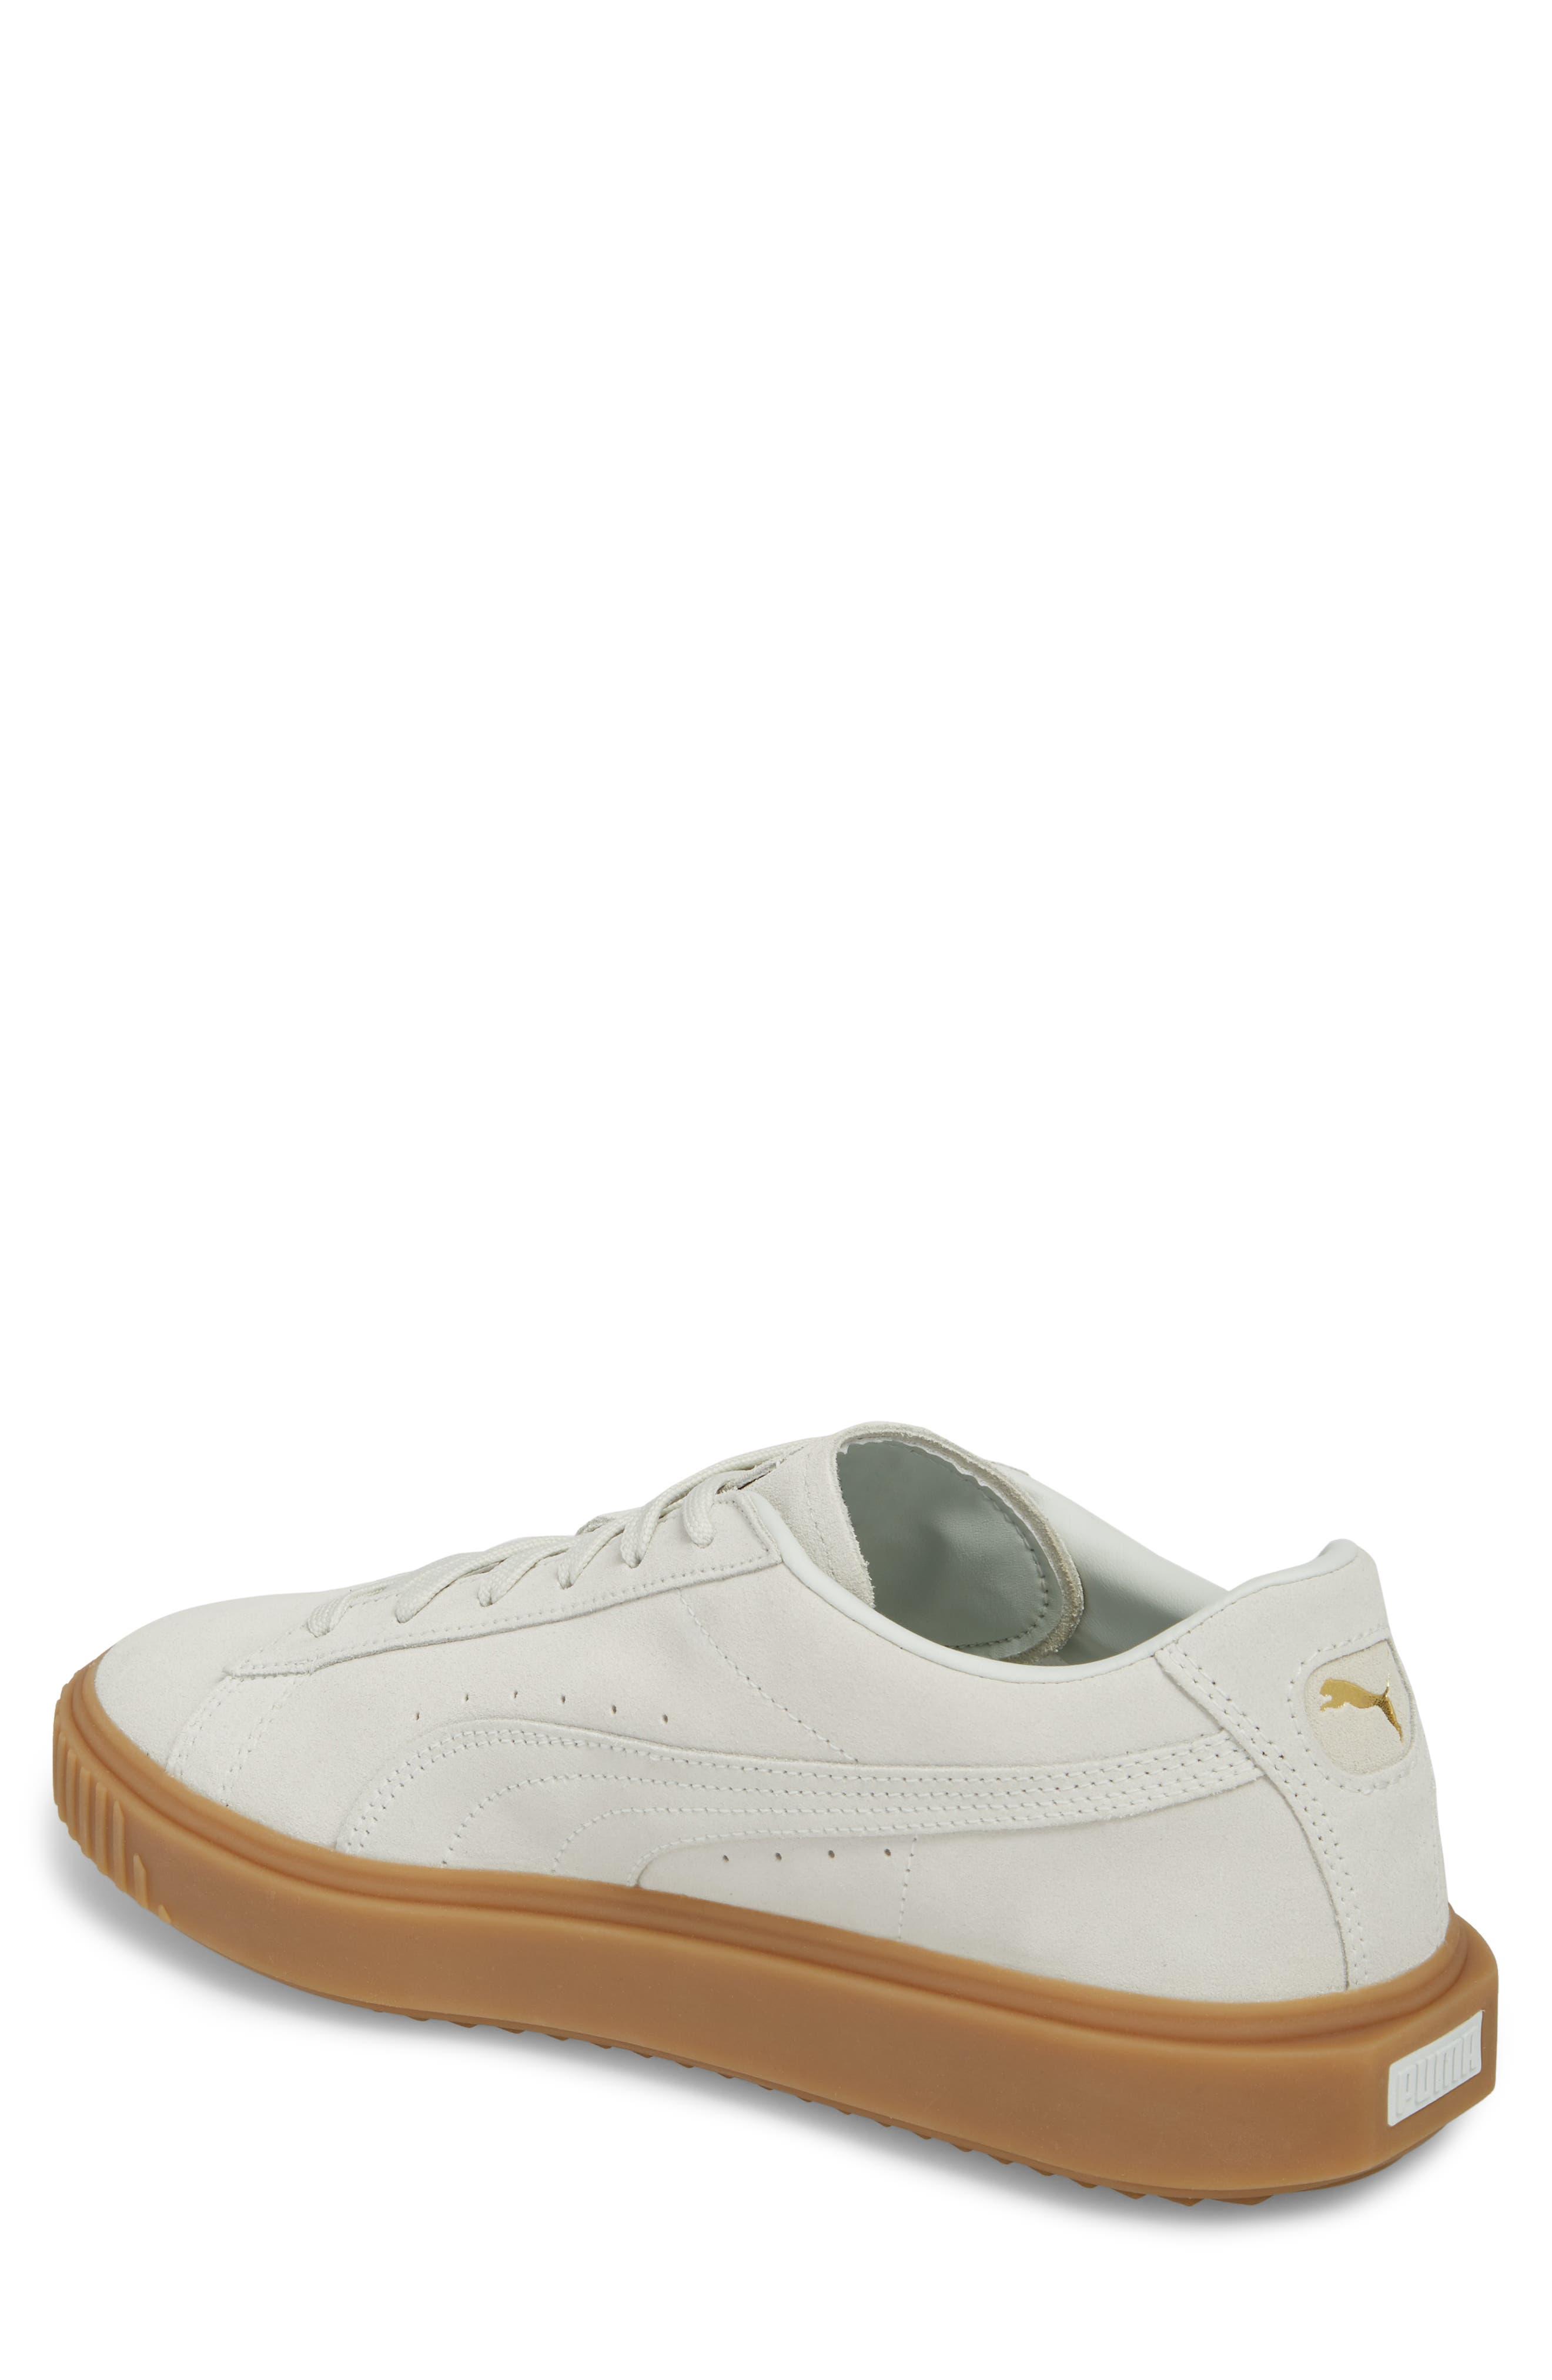 Breaker Suede Gum Low Top Sneaker,                             Alternate thumbnail 4, color,